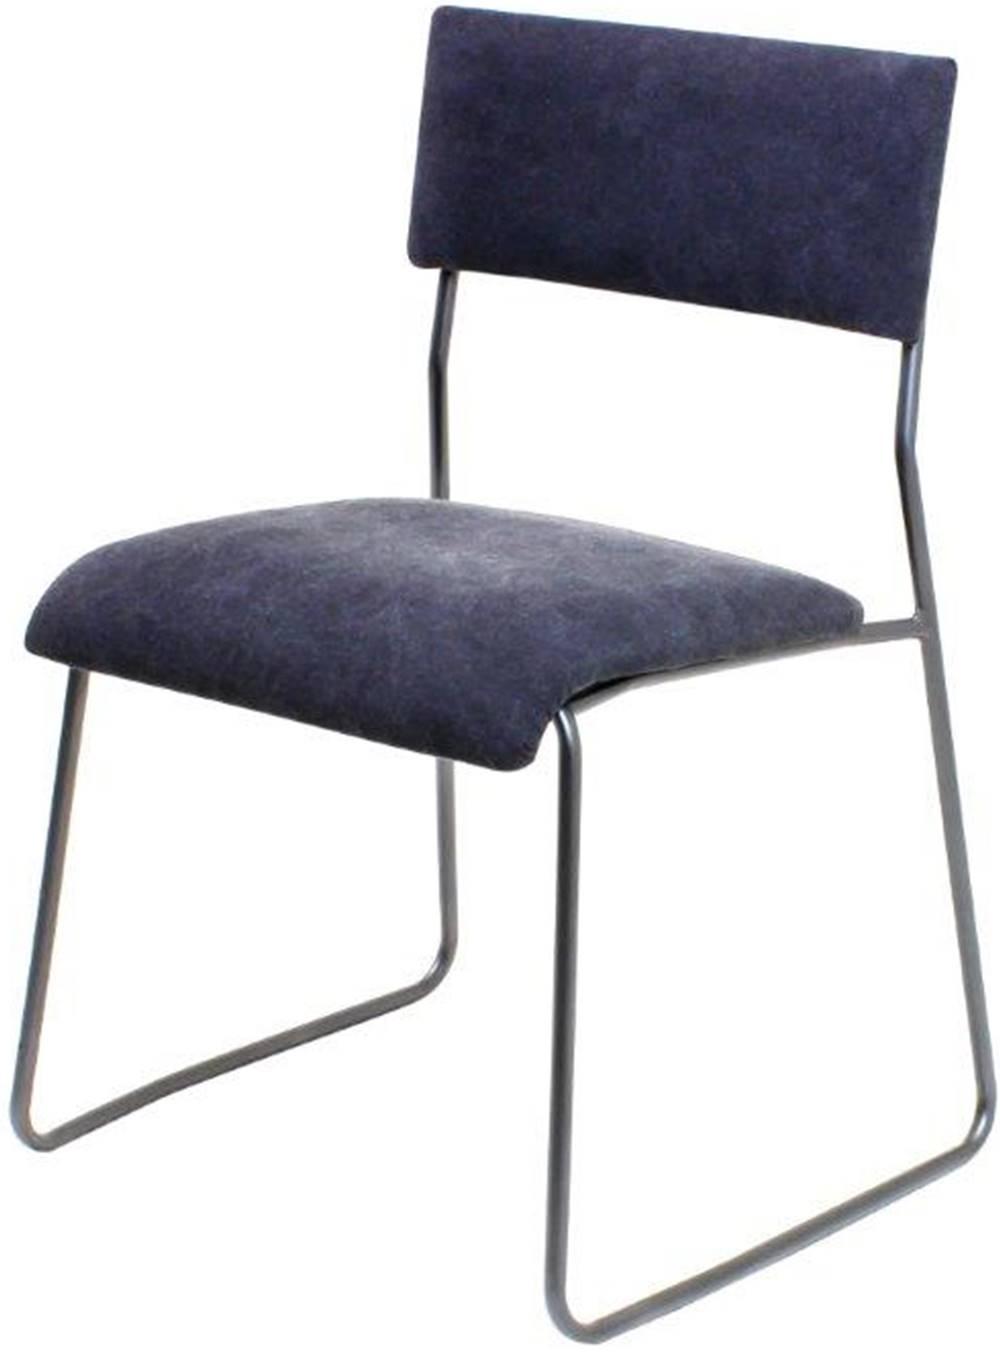 Cadeira Lampa Estofada Lona Preta Base Aco Bruto - 35653